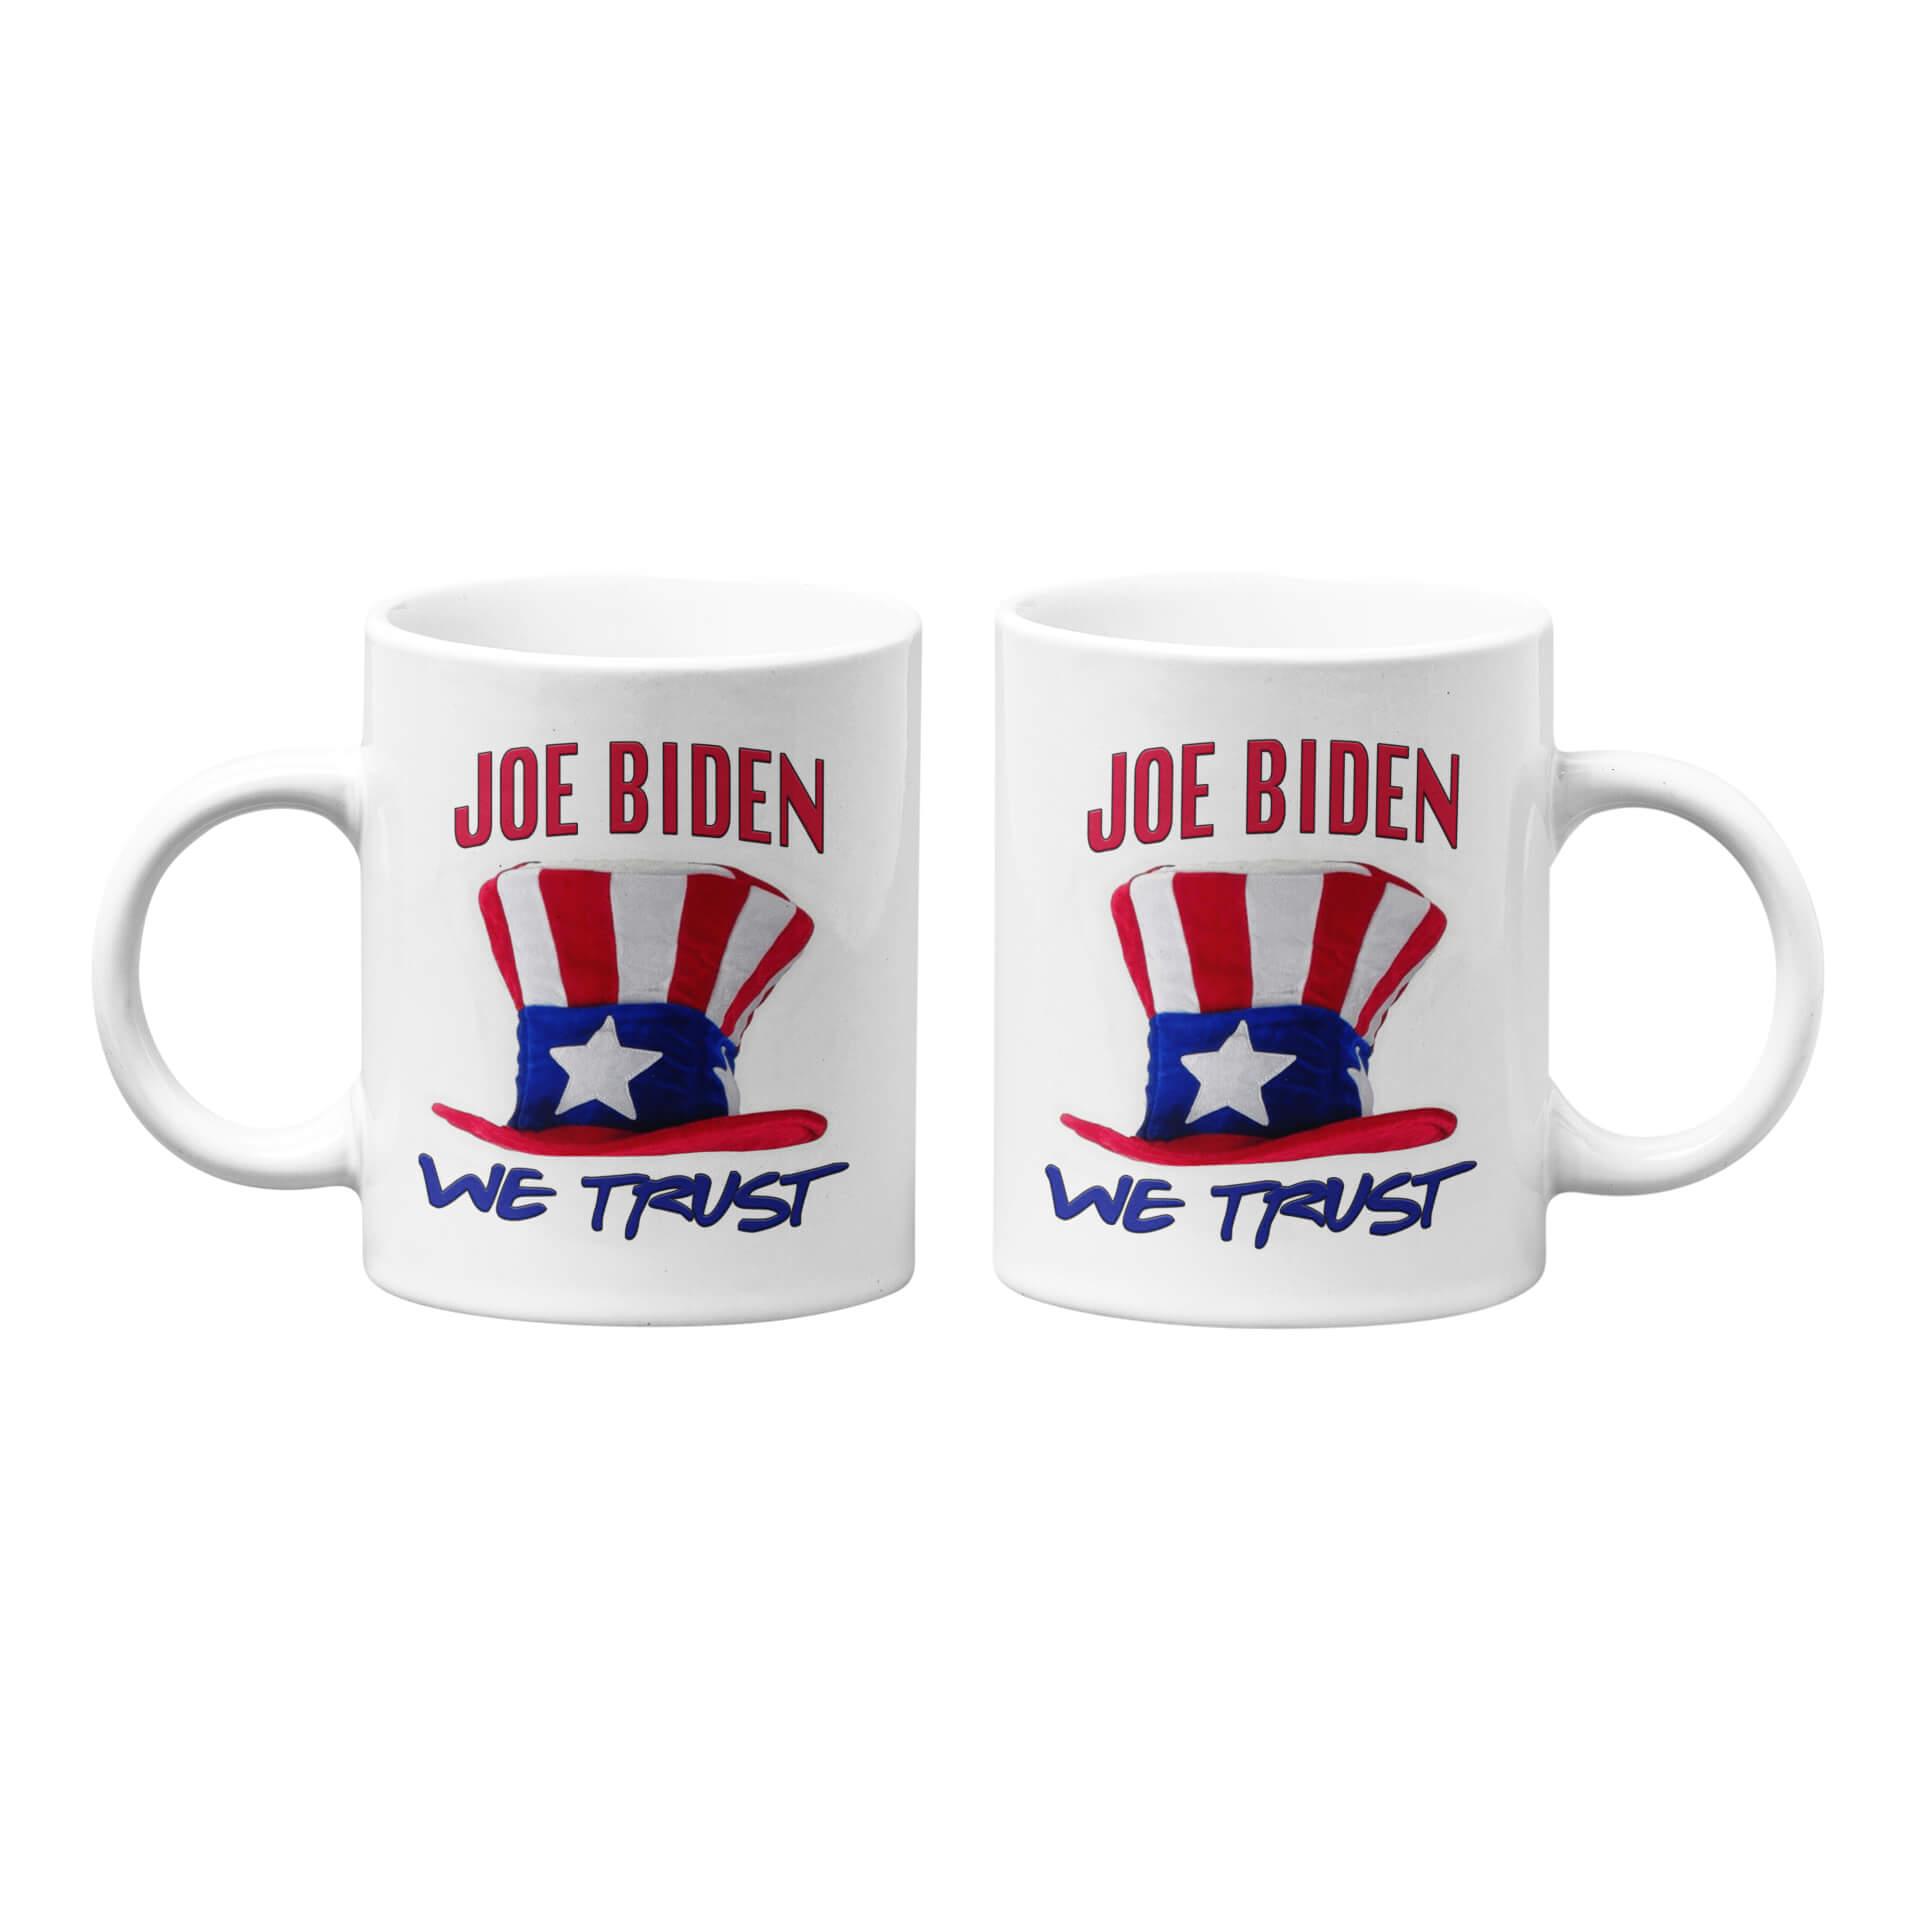 Joe Biden We Trust Mug